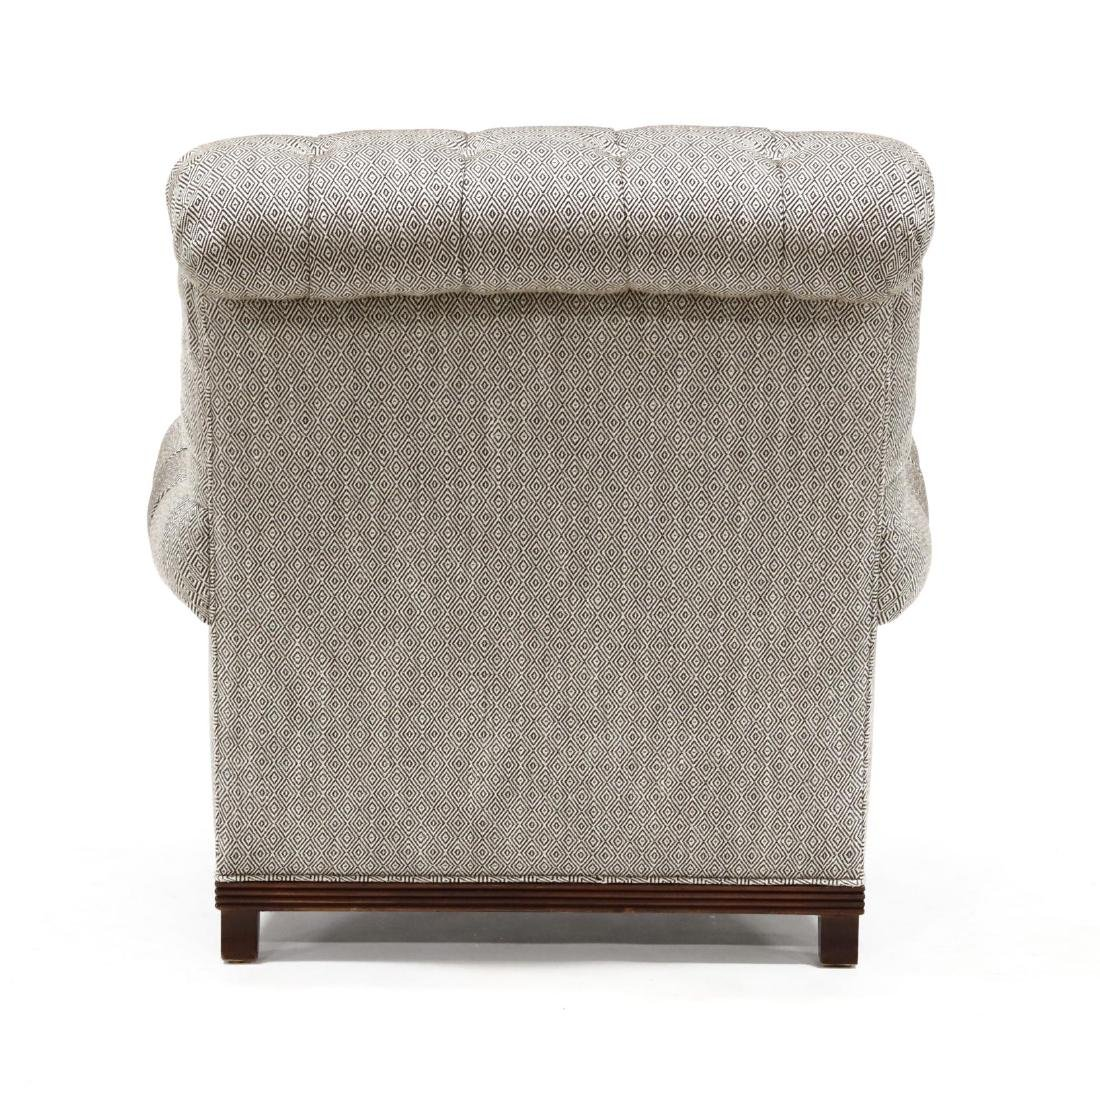 Baker, Overupholstered Library Chair - 3